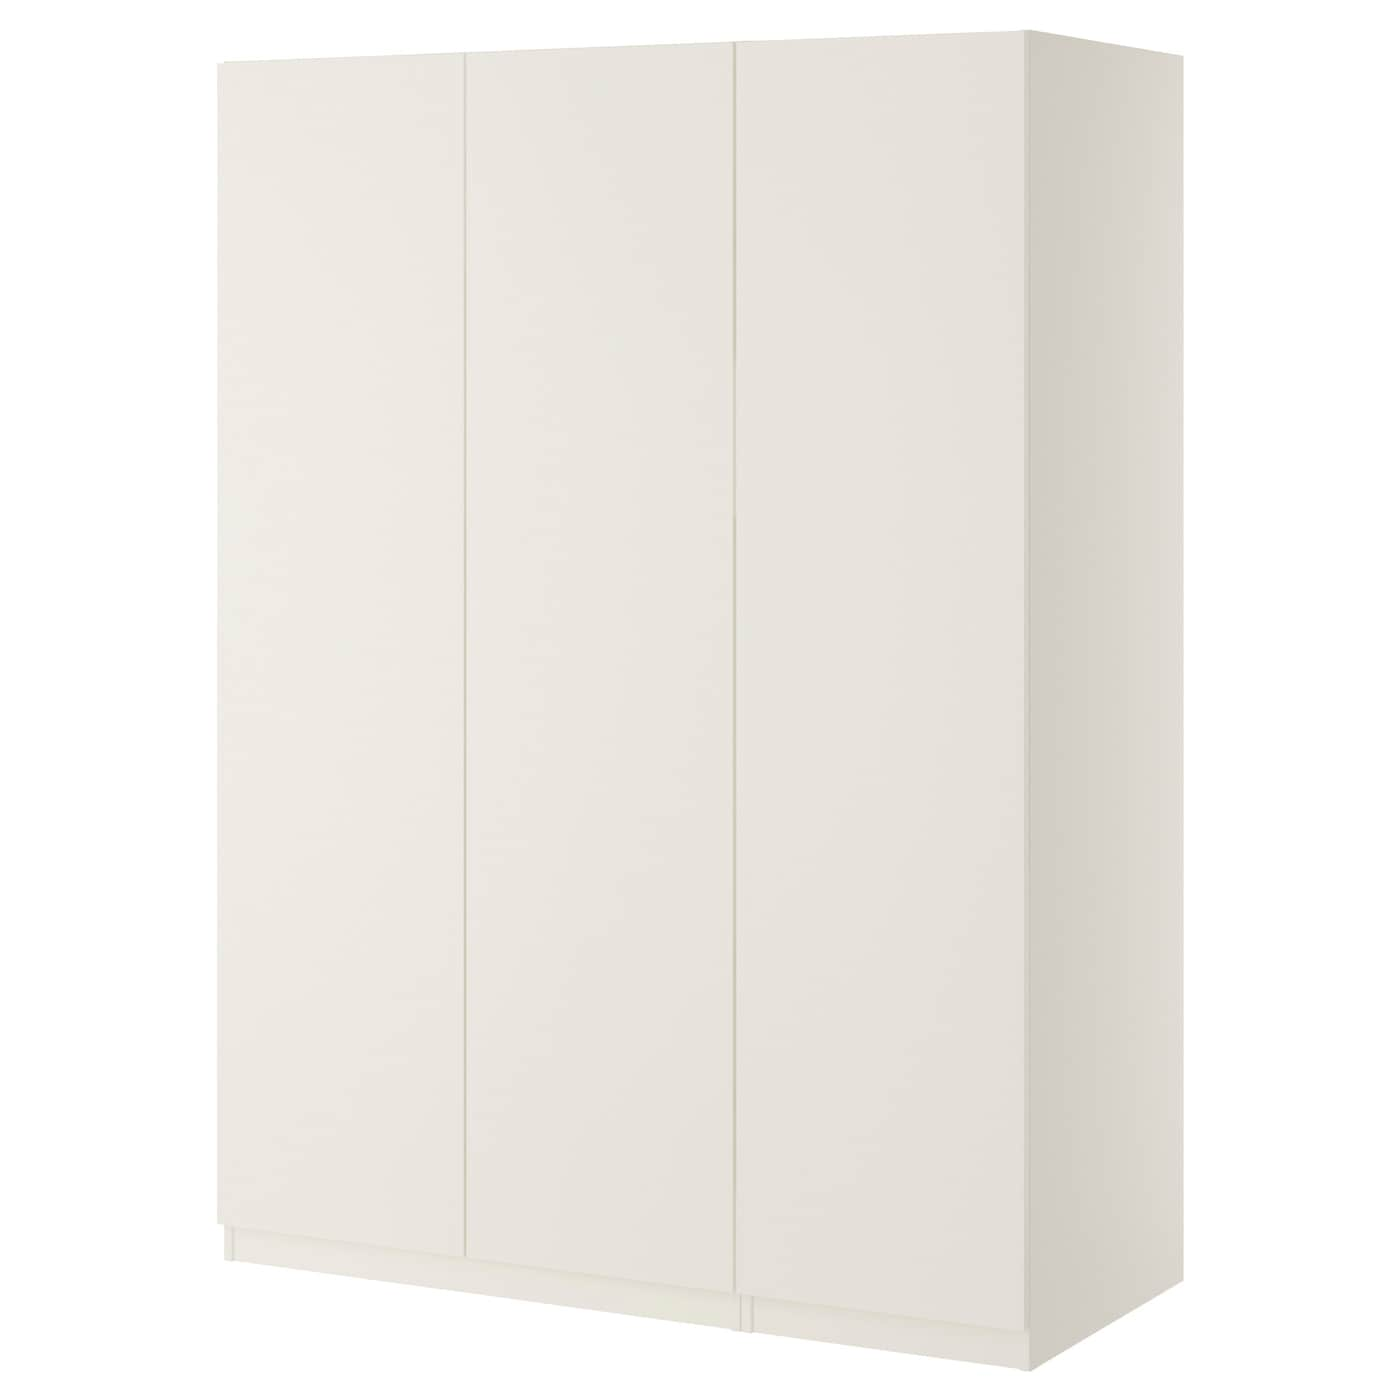 pax wardrobe white ballstad white 150x60x201 cm ikea. Black Bedroom Furniture Sets. Home Design Ideas